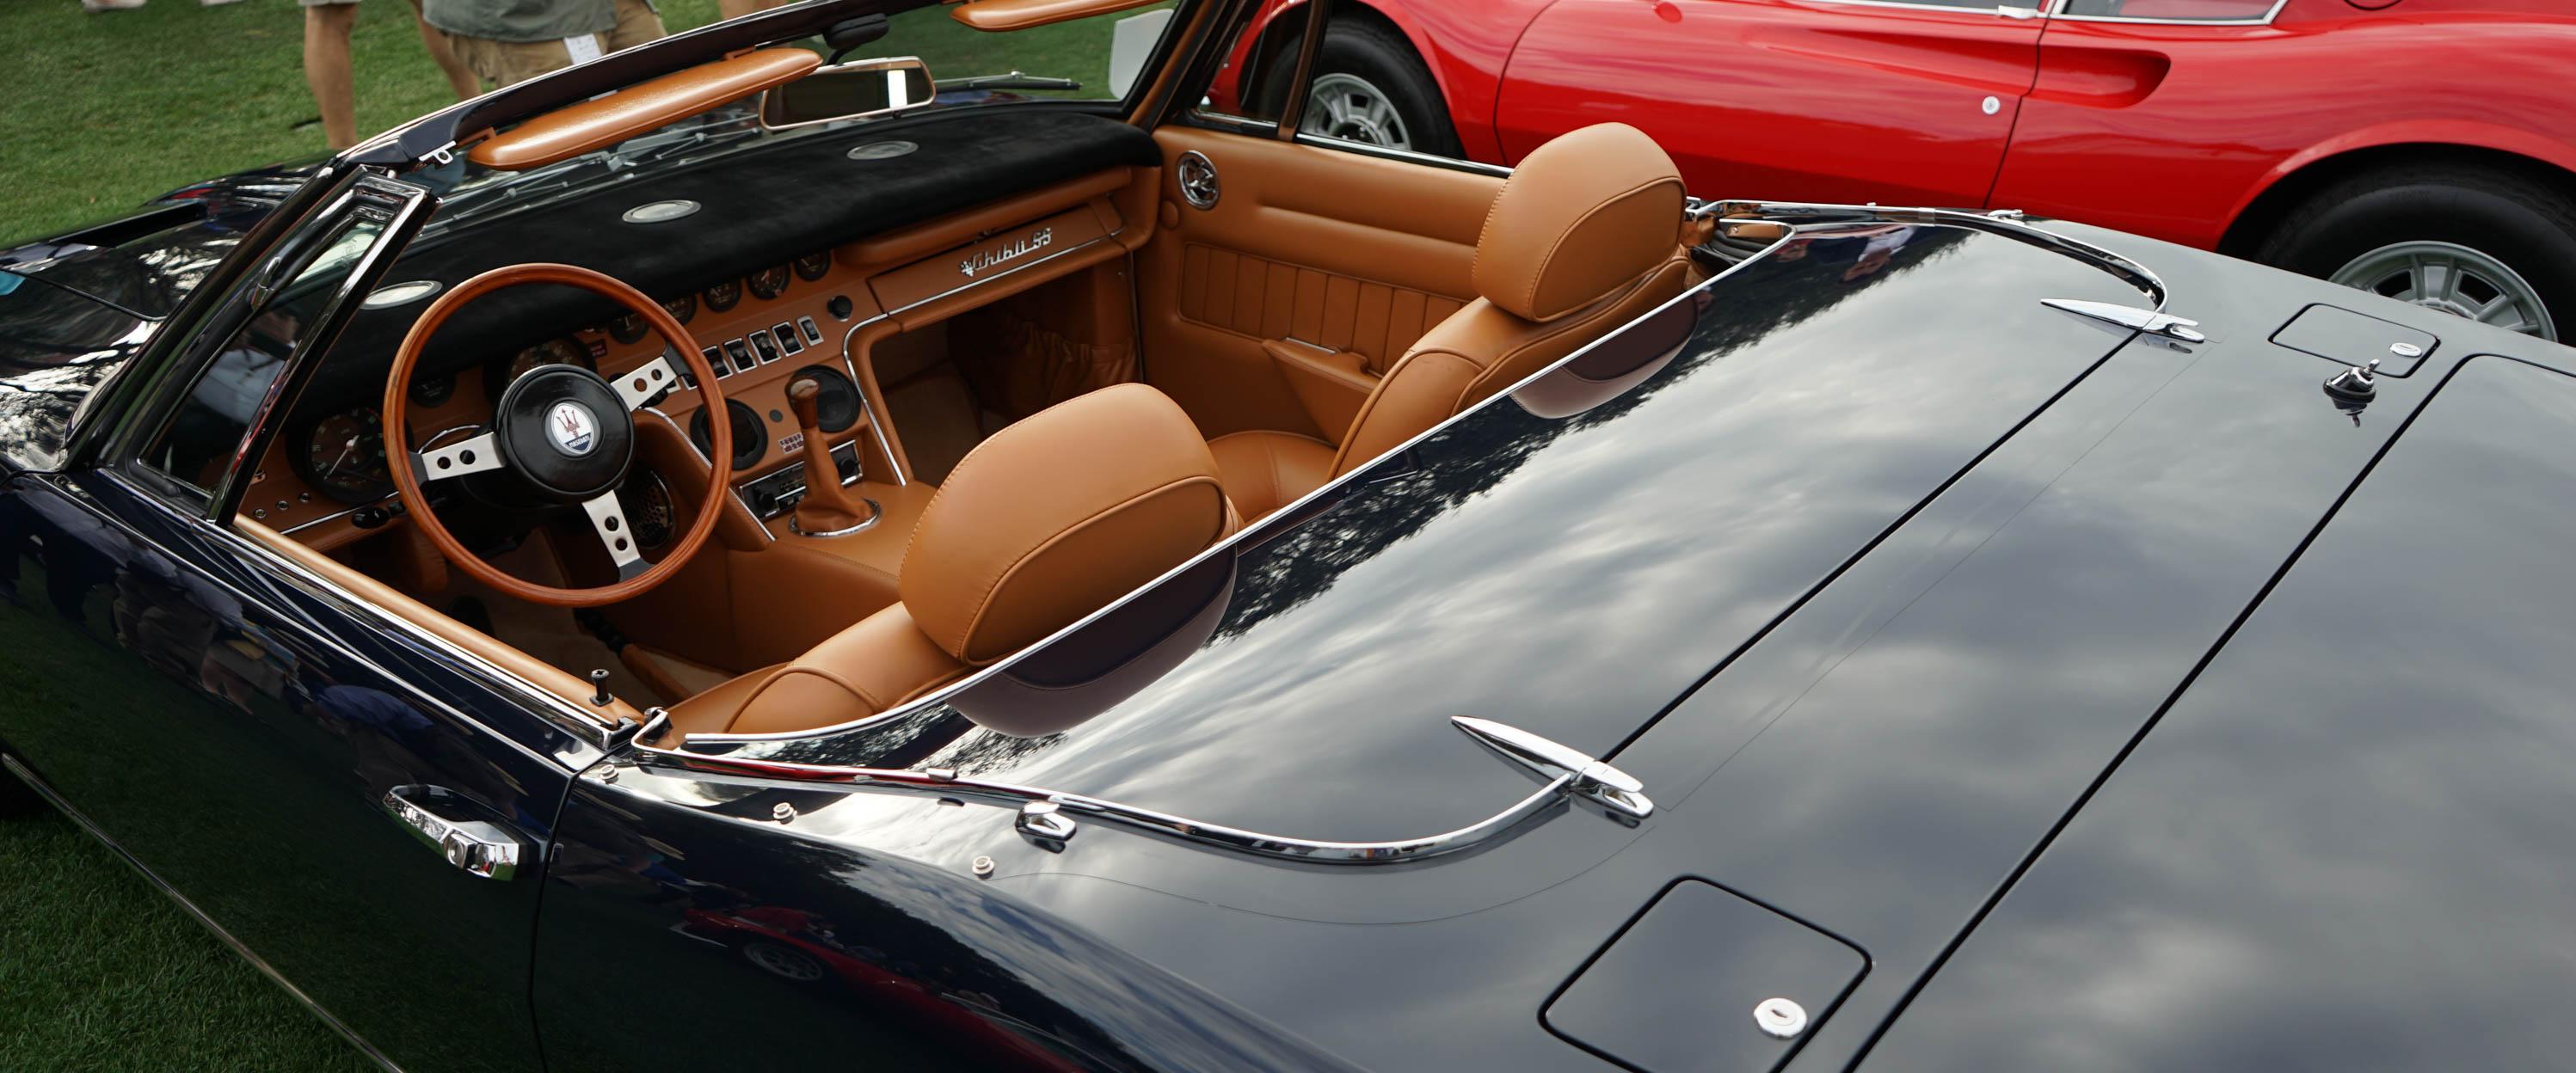 1972-Maserati-Ghibli-SS-Blue-slideshow-0042x.jpg